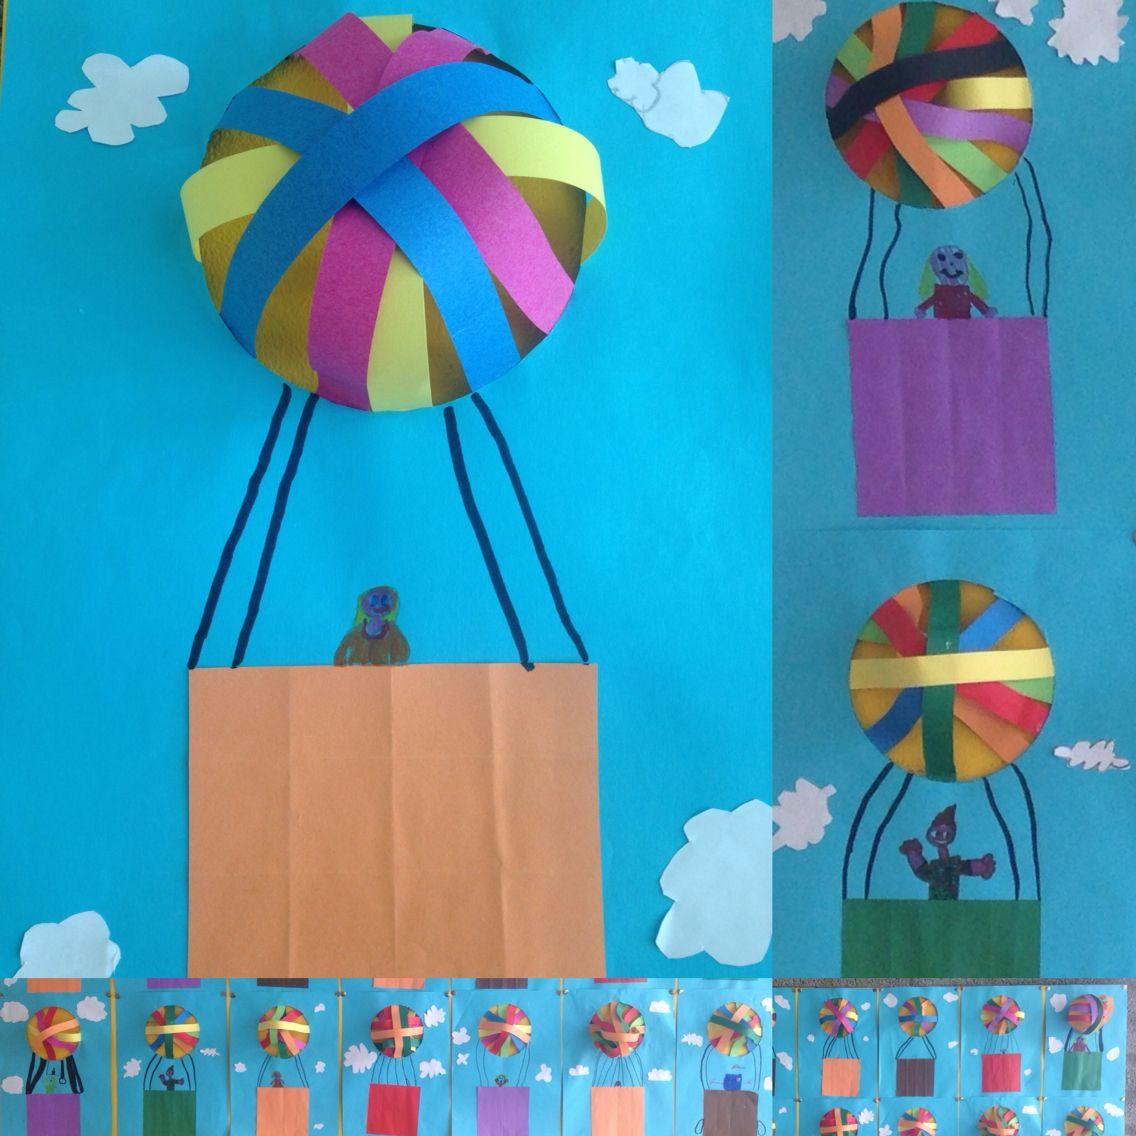 Handvaardigheid Luchtballon Groep 45 Beeldende Vorming Dr